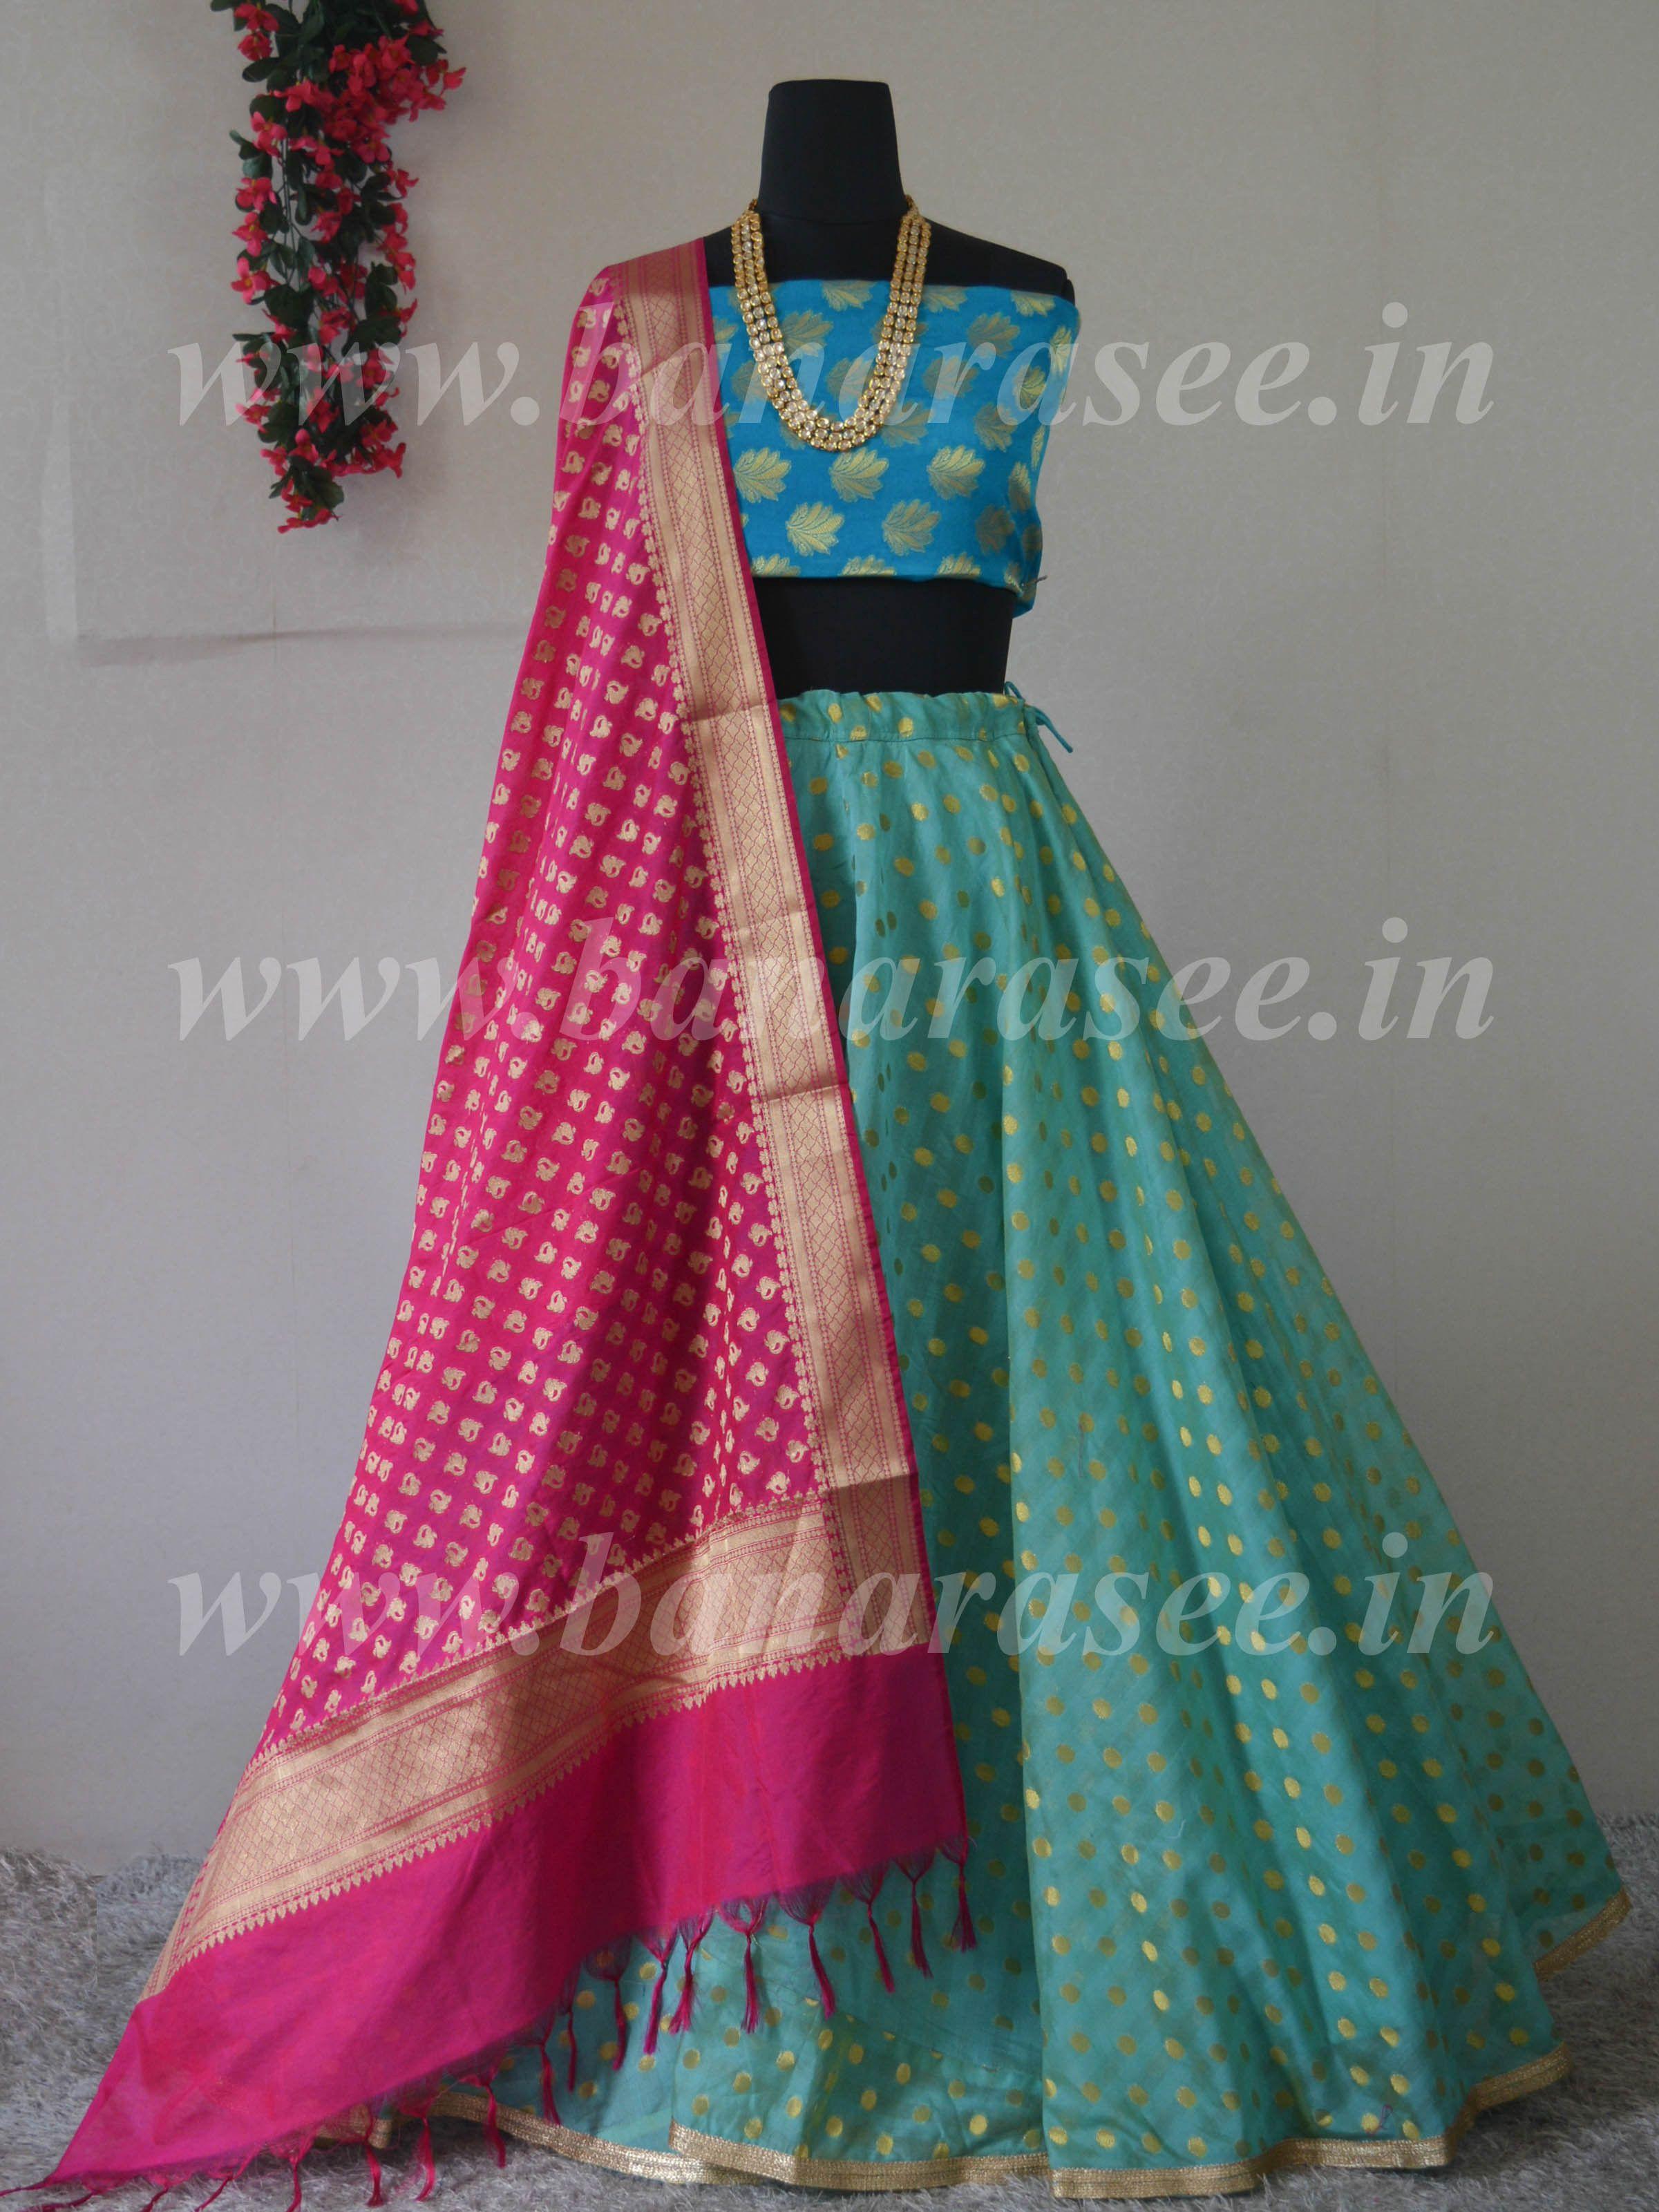 c597284369 Banarasee Stitched Chanderi Lehenga & Blouse Fabric With Pink  Dupatta-Blue(Dual Tone)